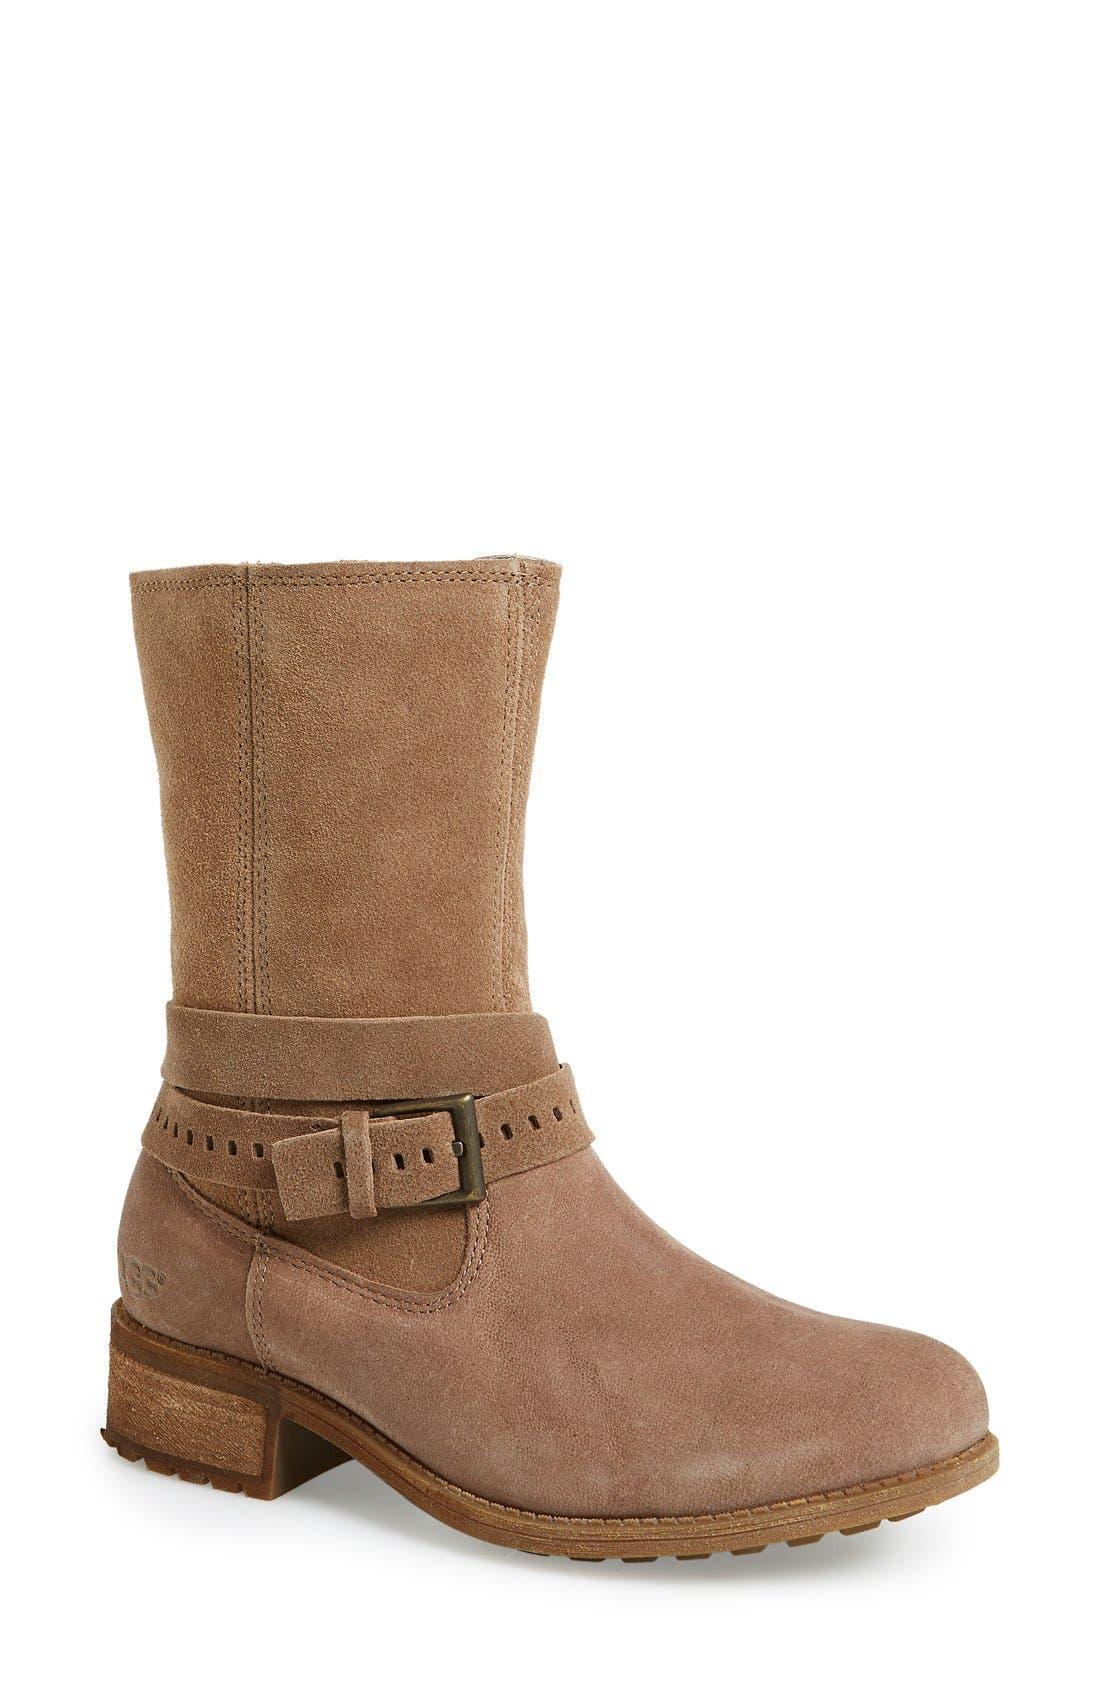 Main Image - UGG® Australia 'Kiings' Water Resistant Boot (Women)